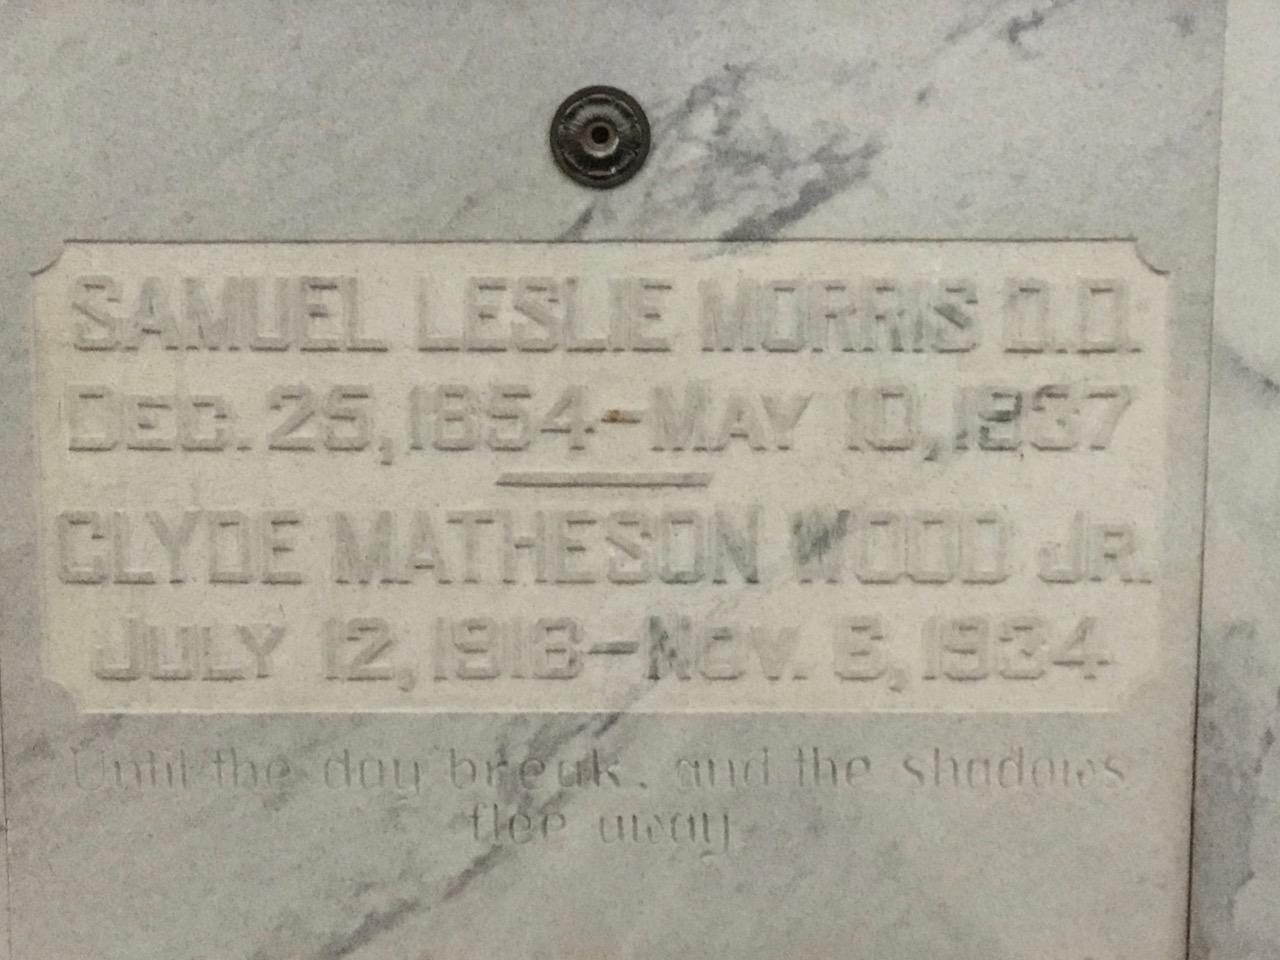 Samuel Leslie Morris is buried at Crest Lawn Cemetery, Atlanta, Georgia.